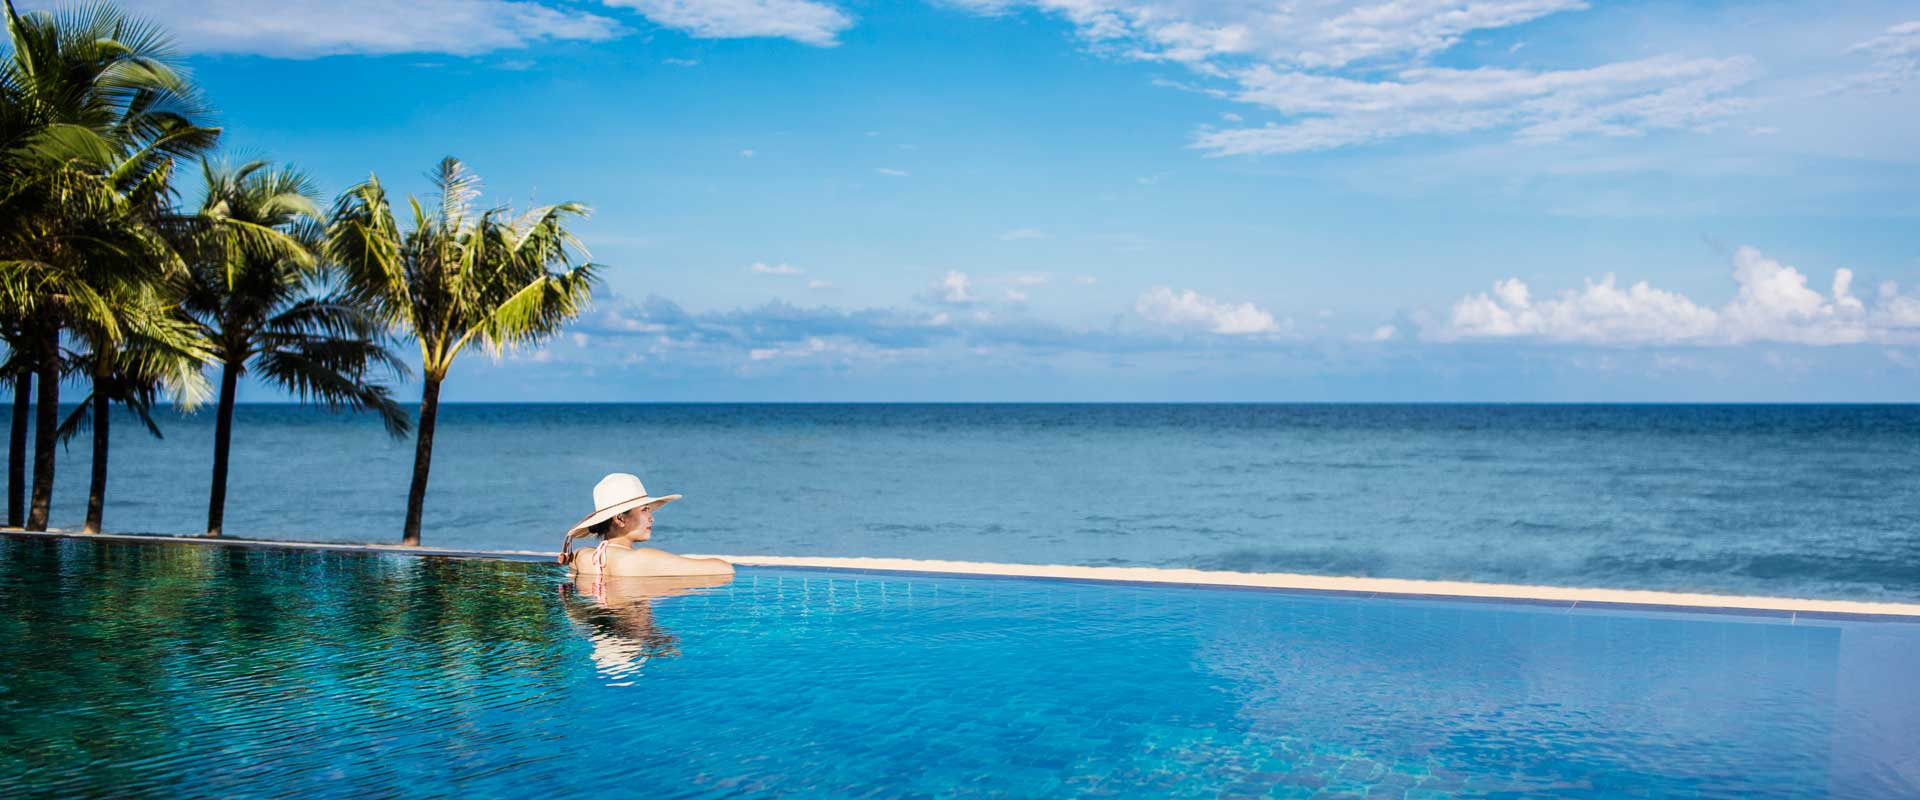 Moonrise-Beach-Resort-Pool